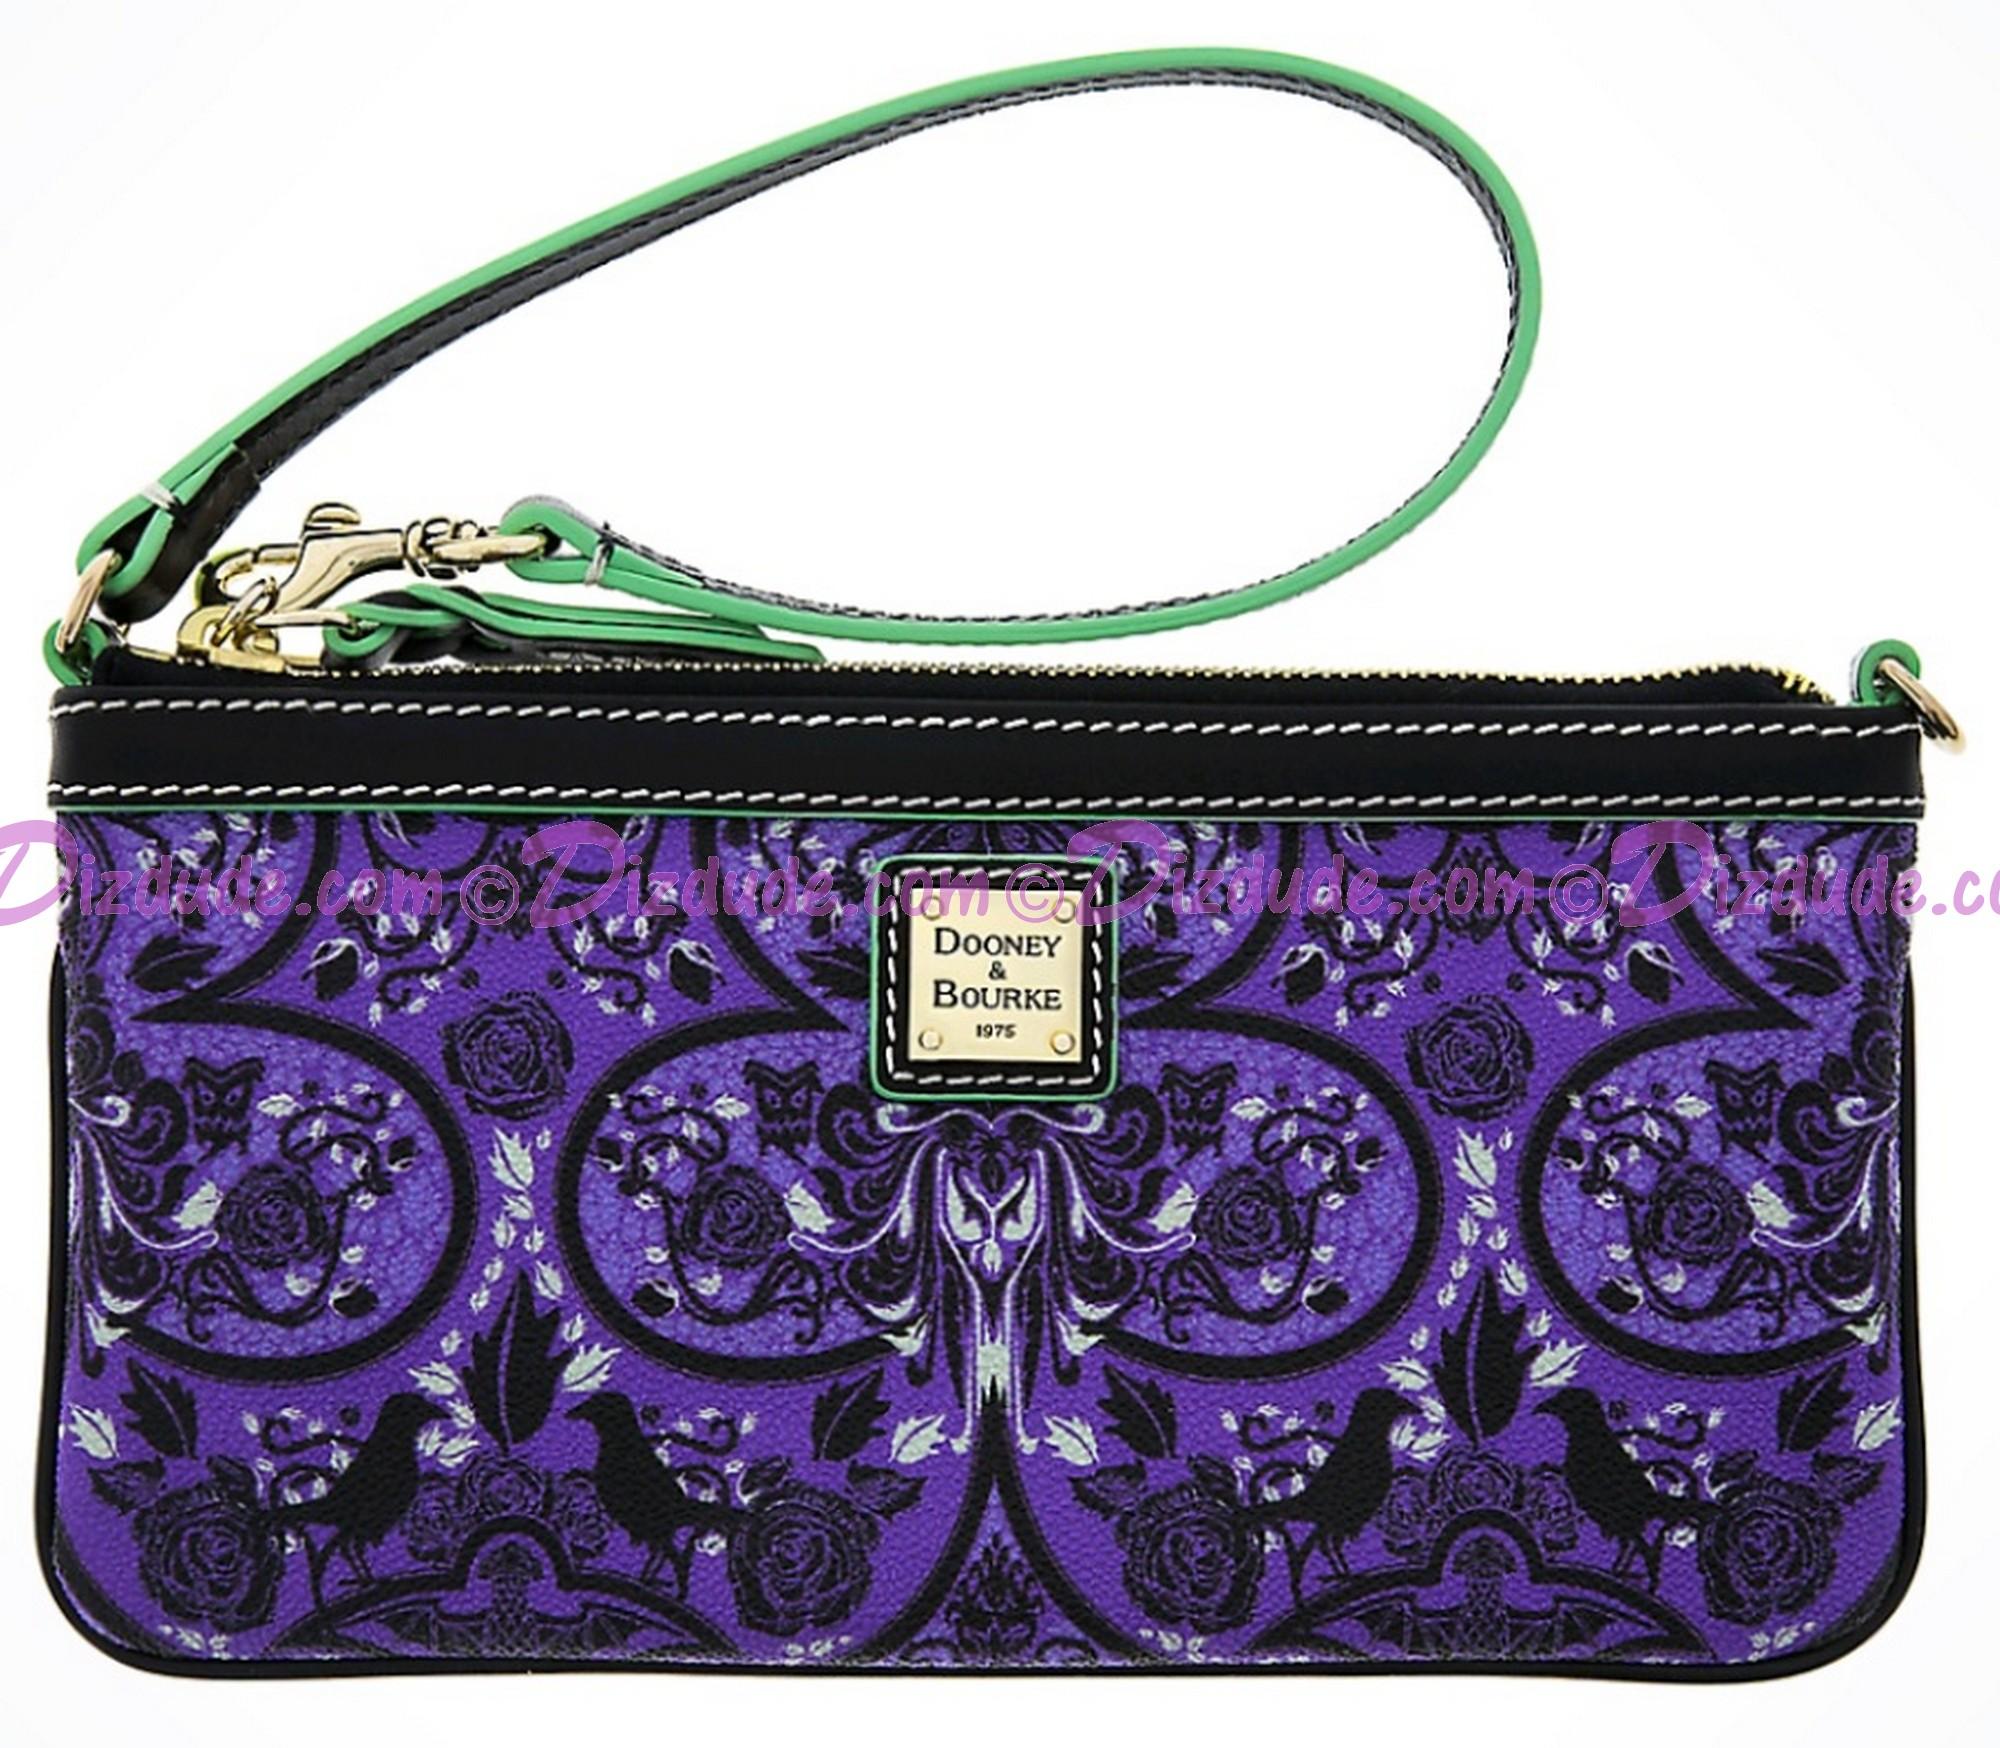 Dooney & Bourke - Disney Haunted Mansion Madame Leota Wristlet Handbag © Dizdude.com